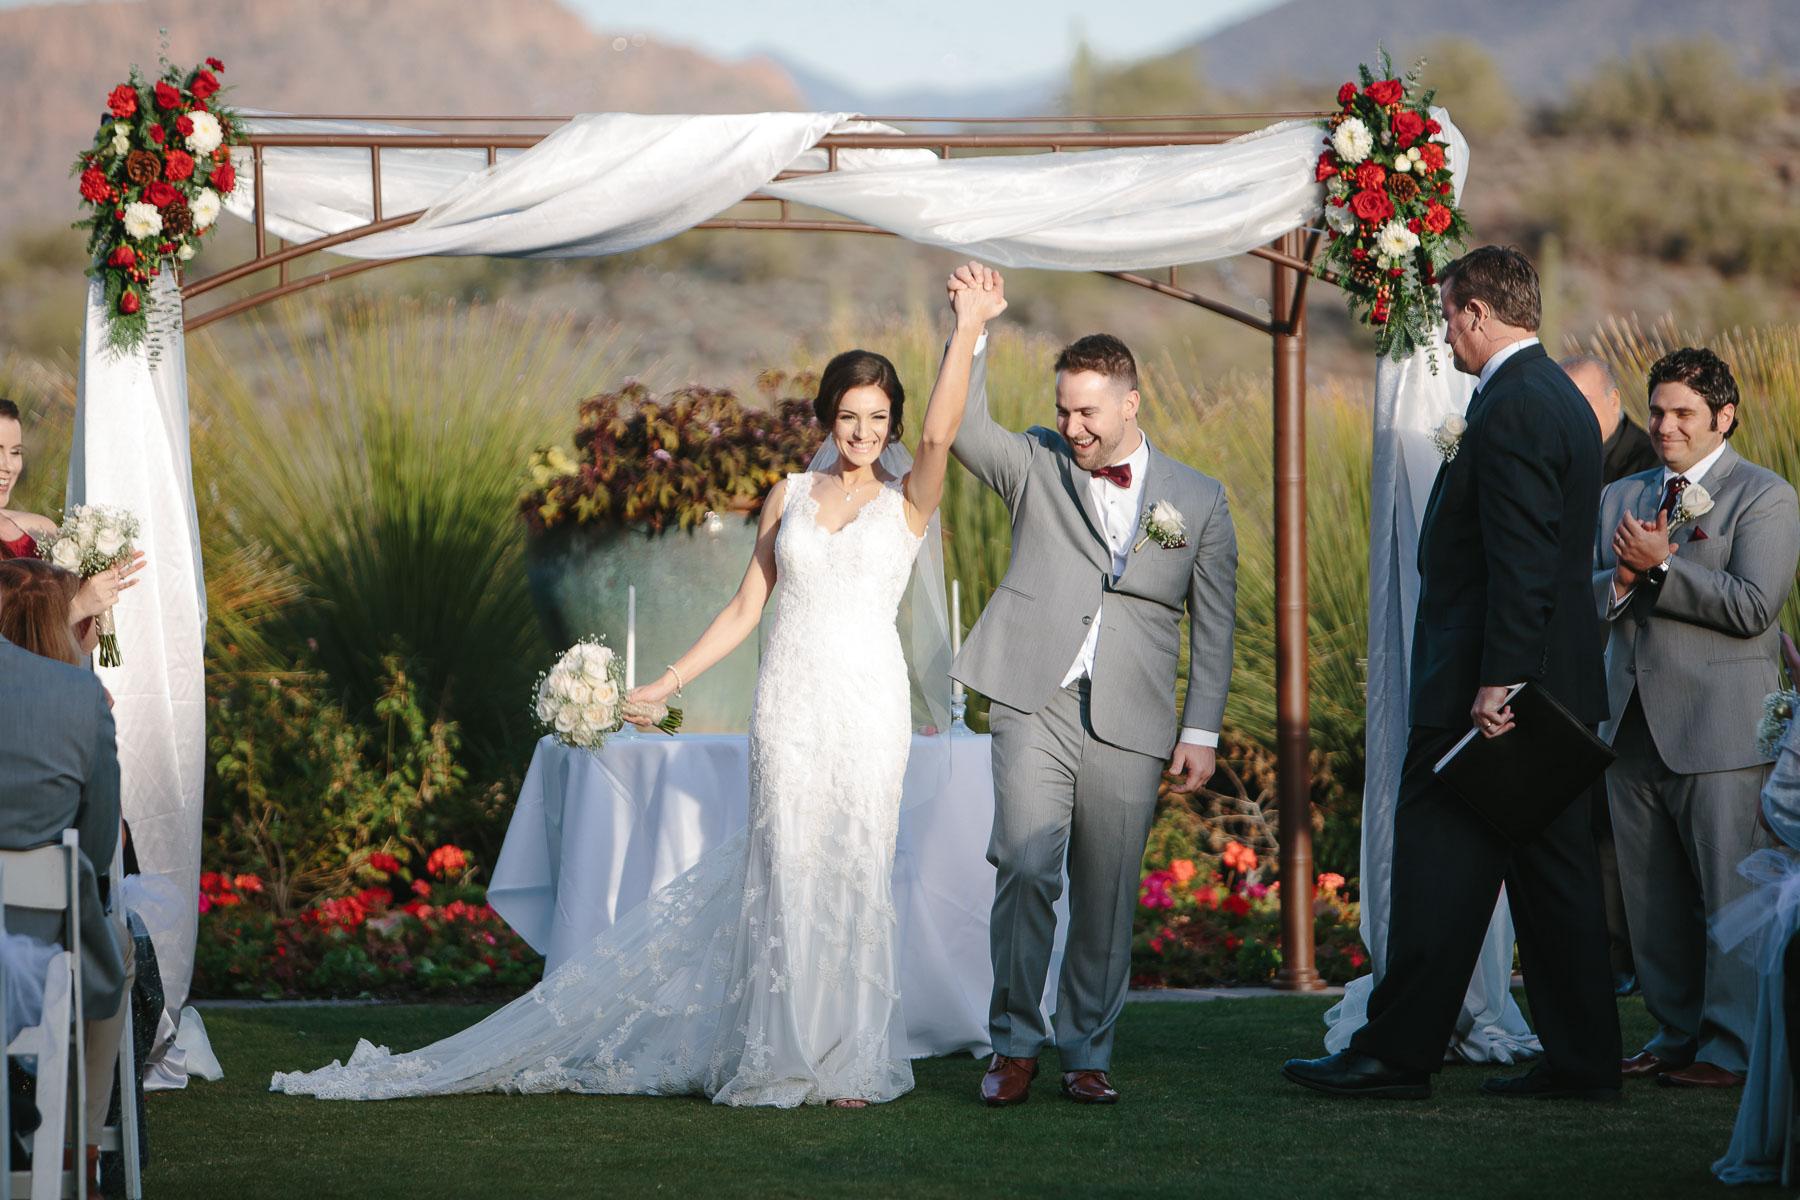 161210-Luxium-Weddings-Arizona-Matt-Jenny-Anthem-Golf-Country-Club-1039.jpg